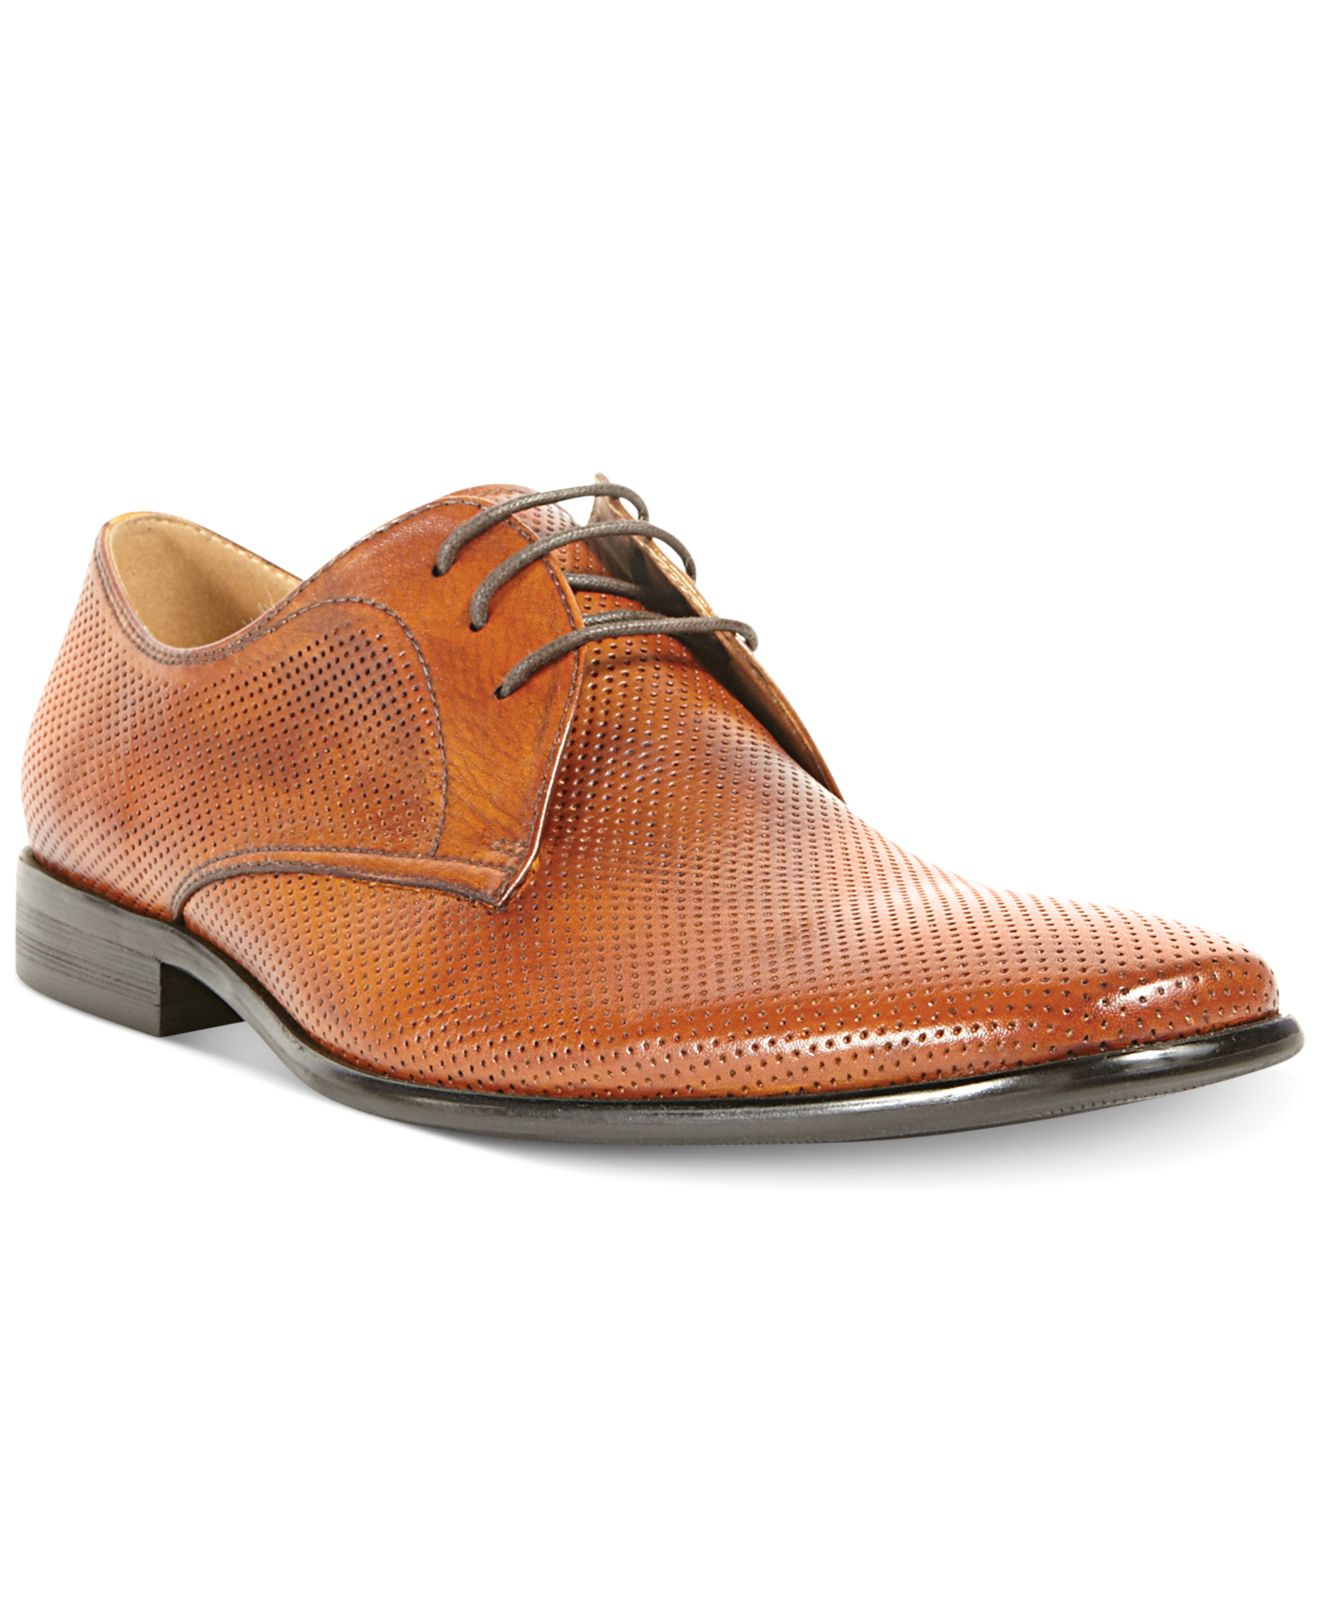 8f1a5fec2ac Steve Madden Brown Havin Dress Shoes for men